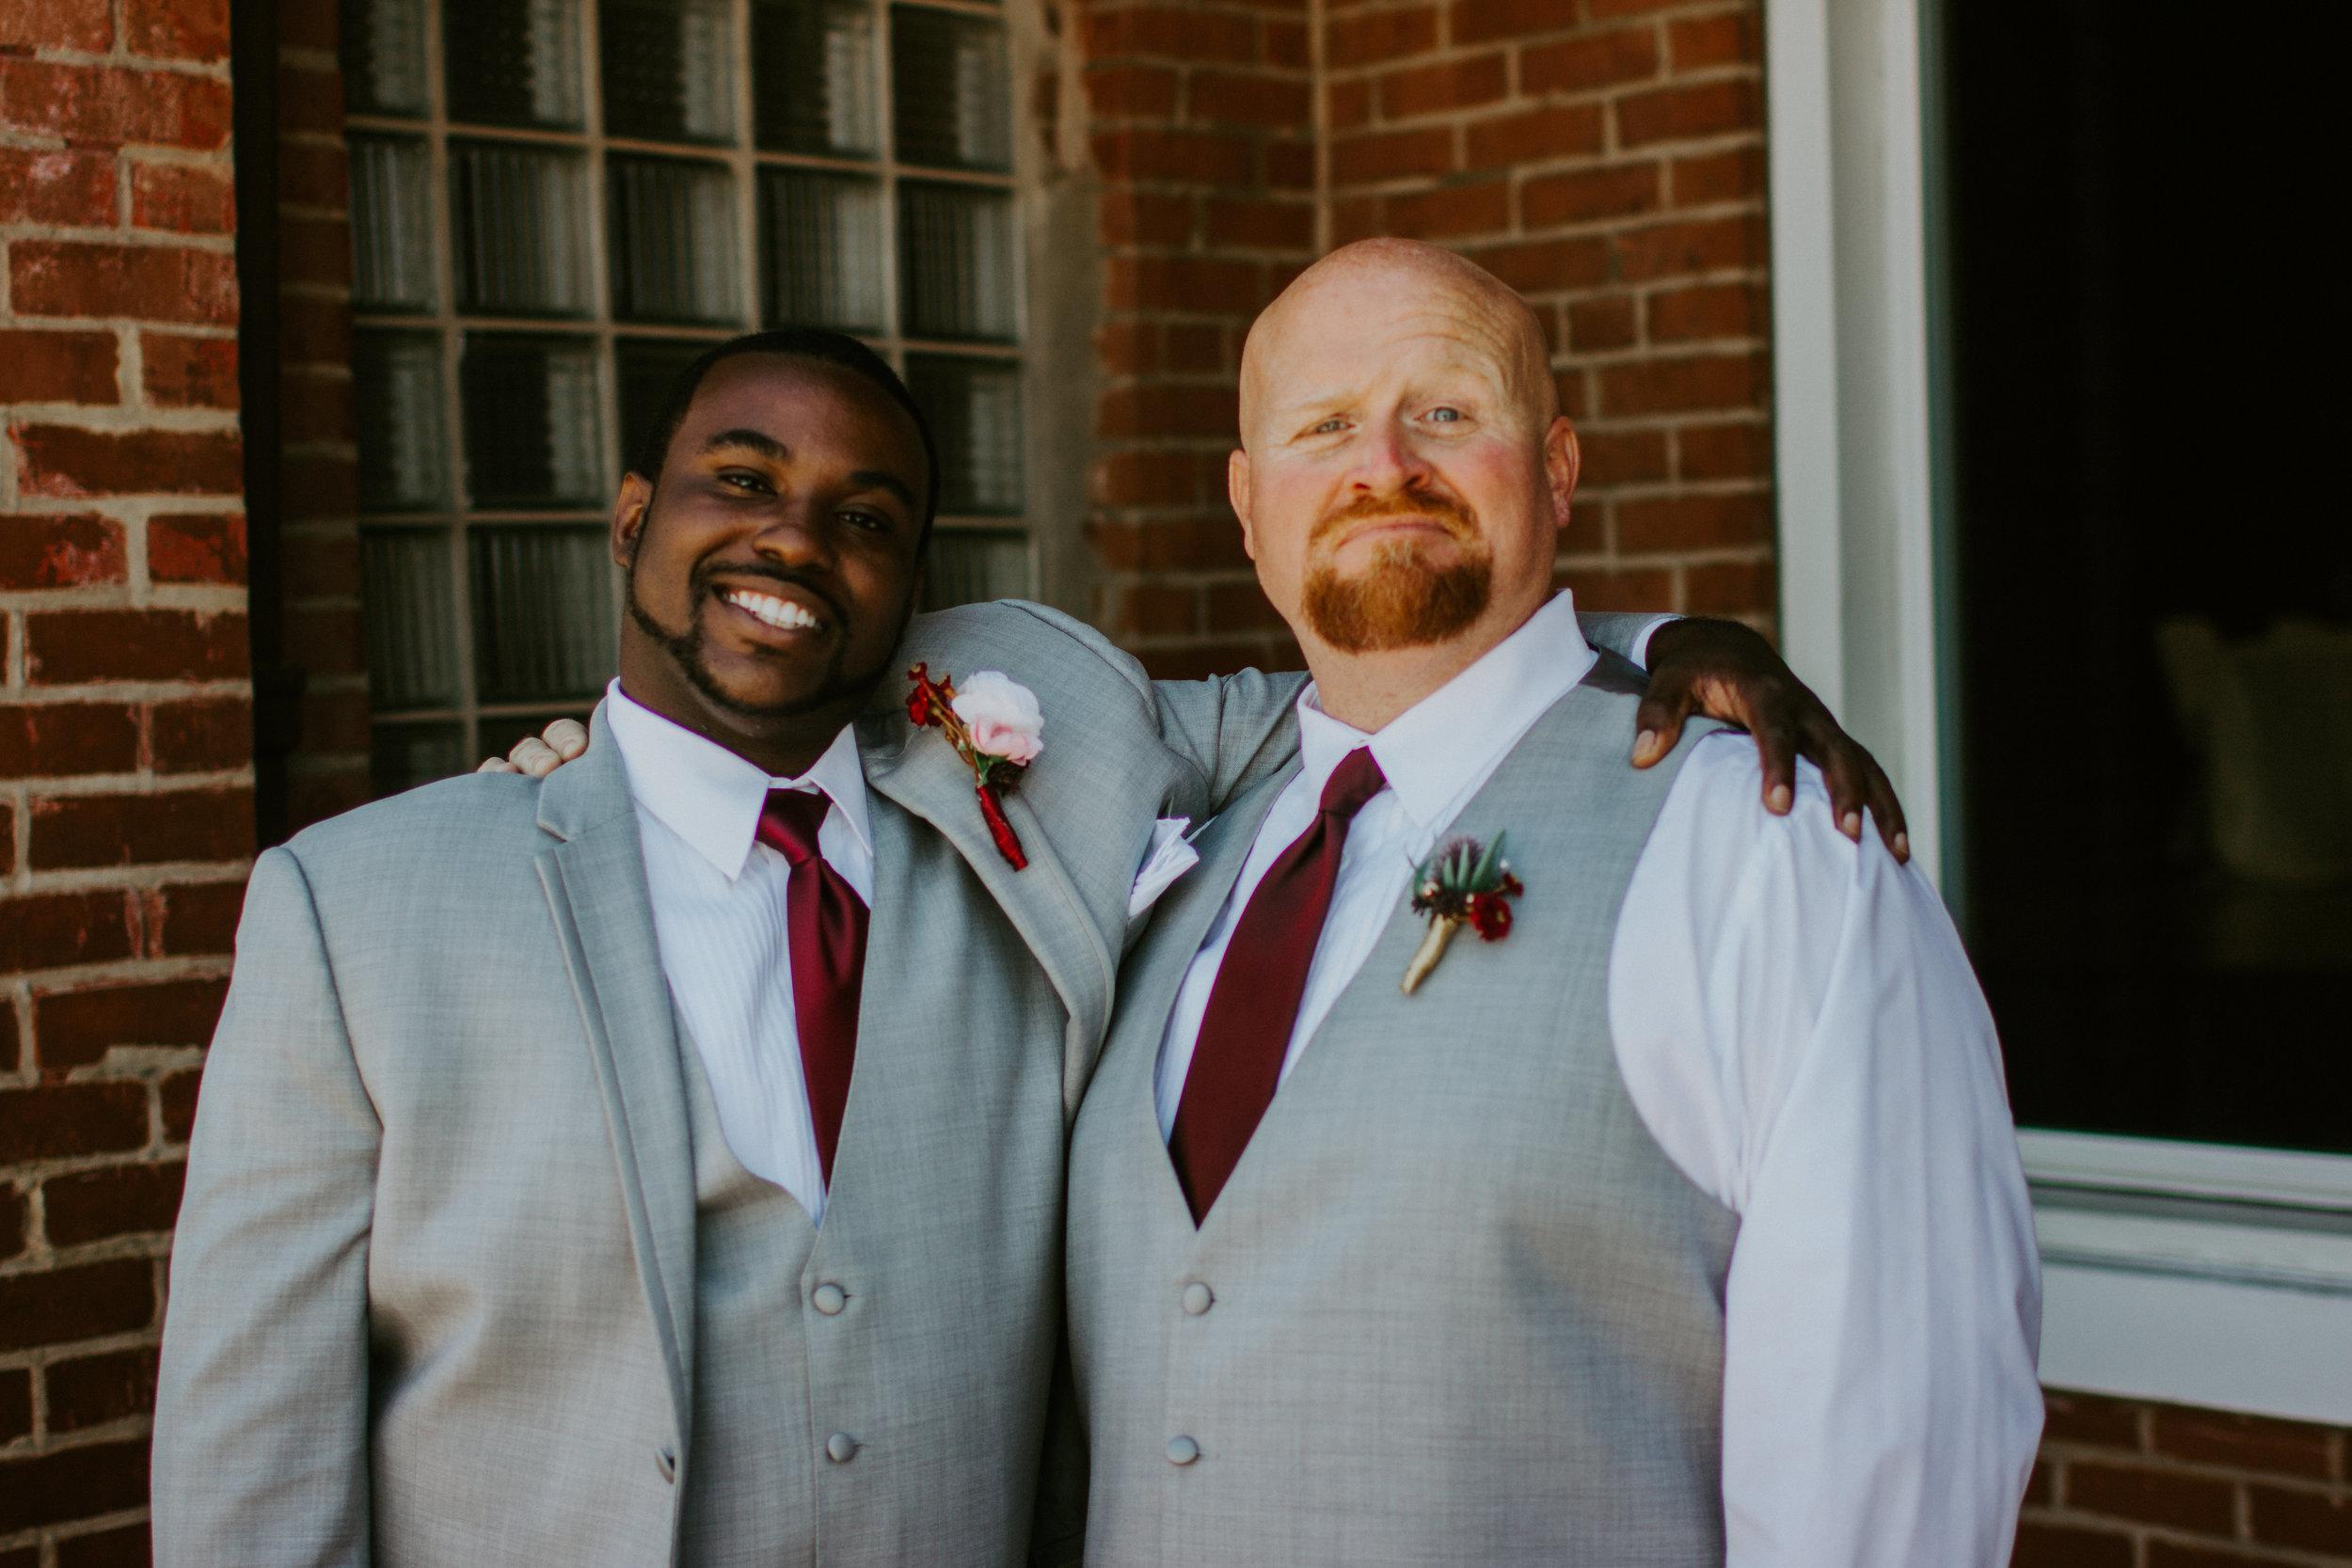 WonderlyCreative_Wedding_6.7.18_Khara&Dwayne_-328.jpg